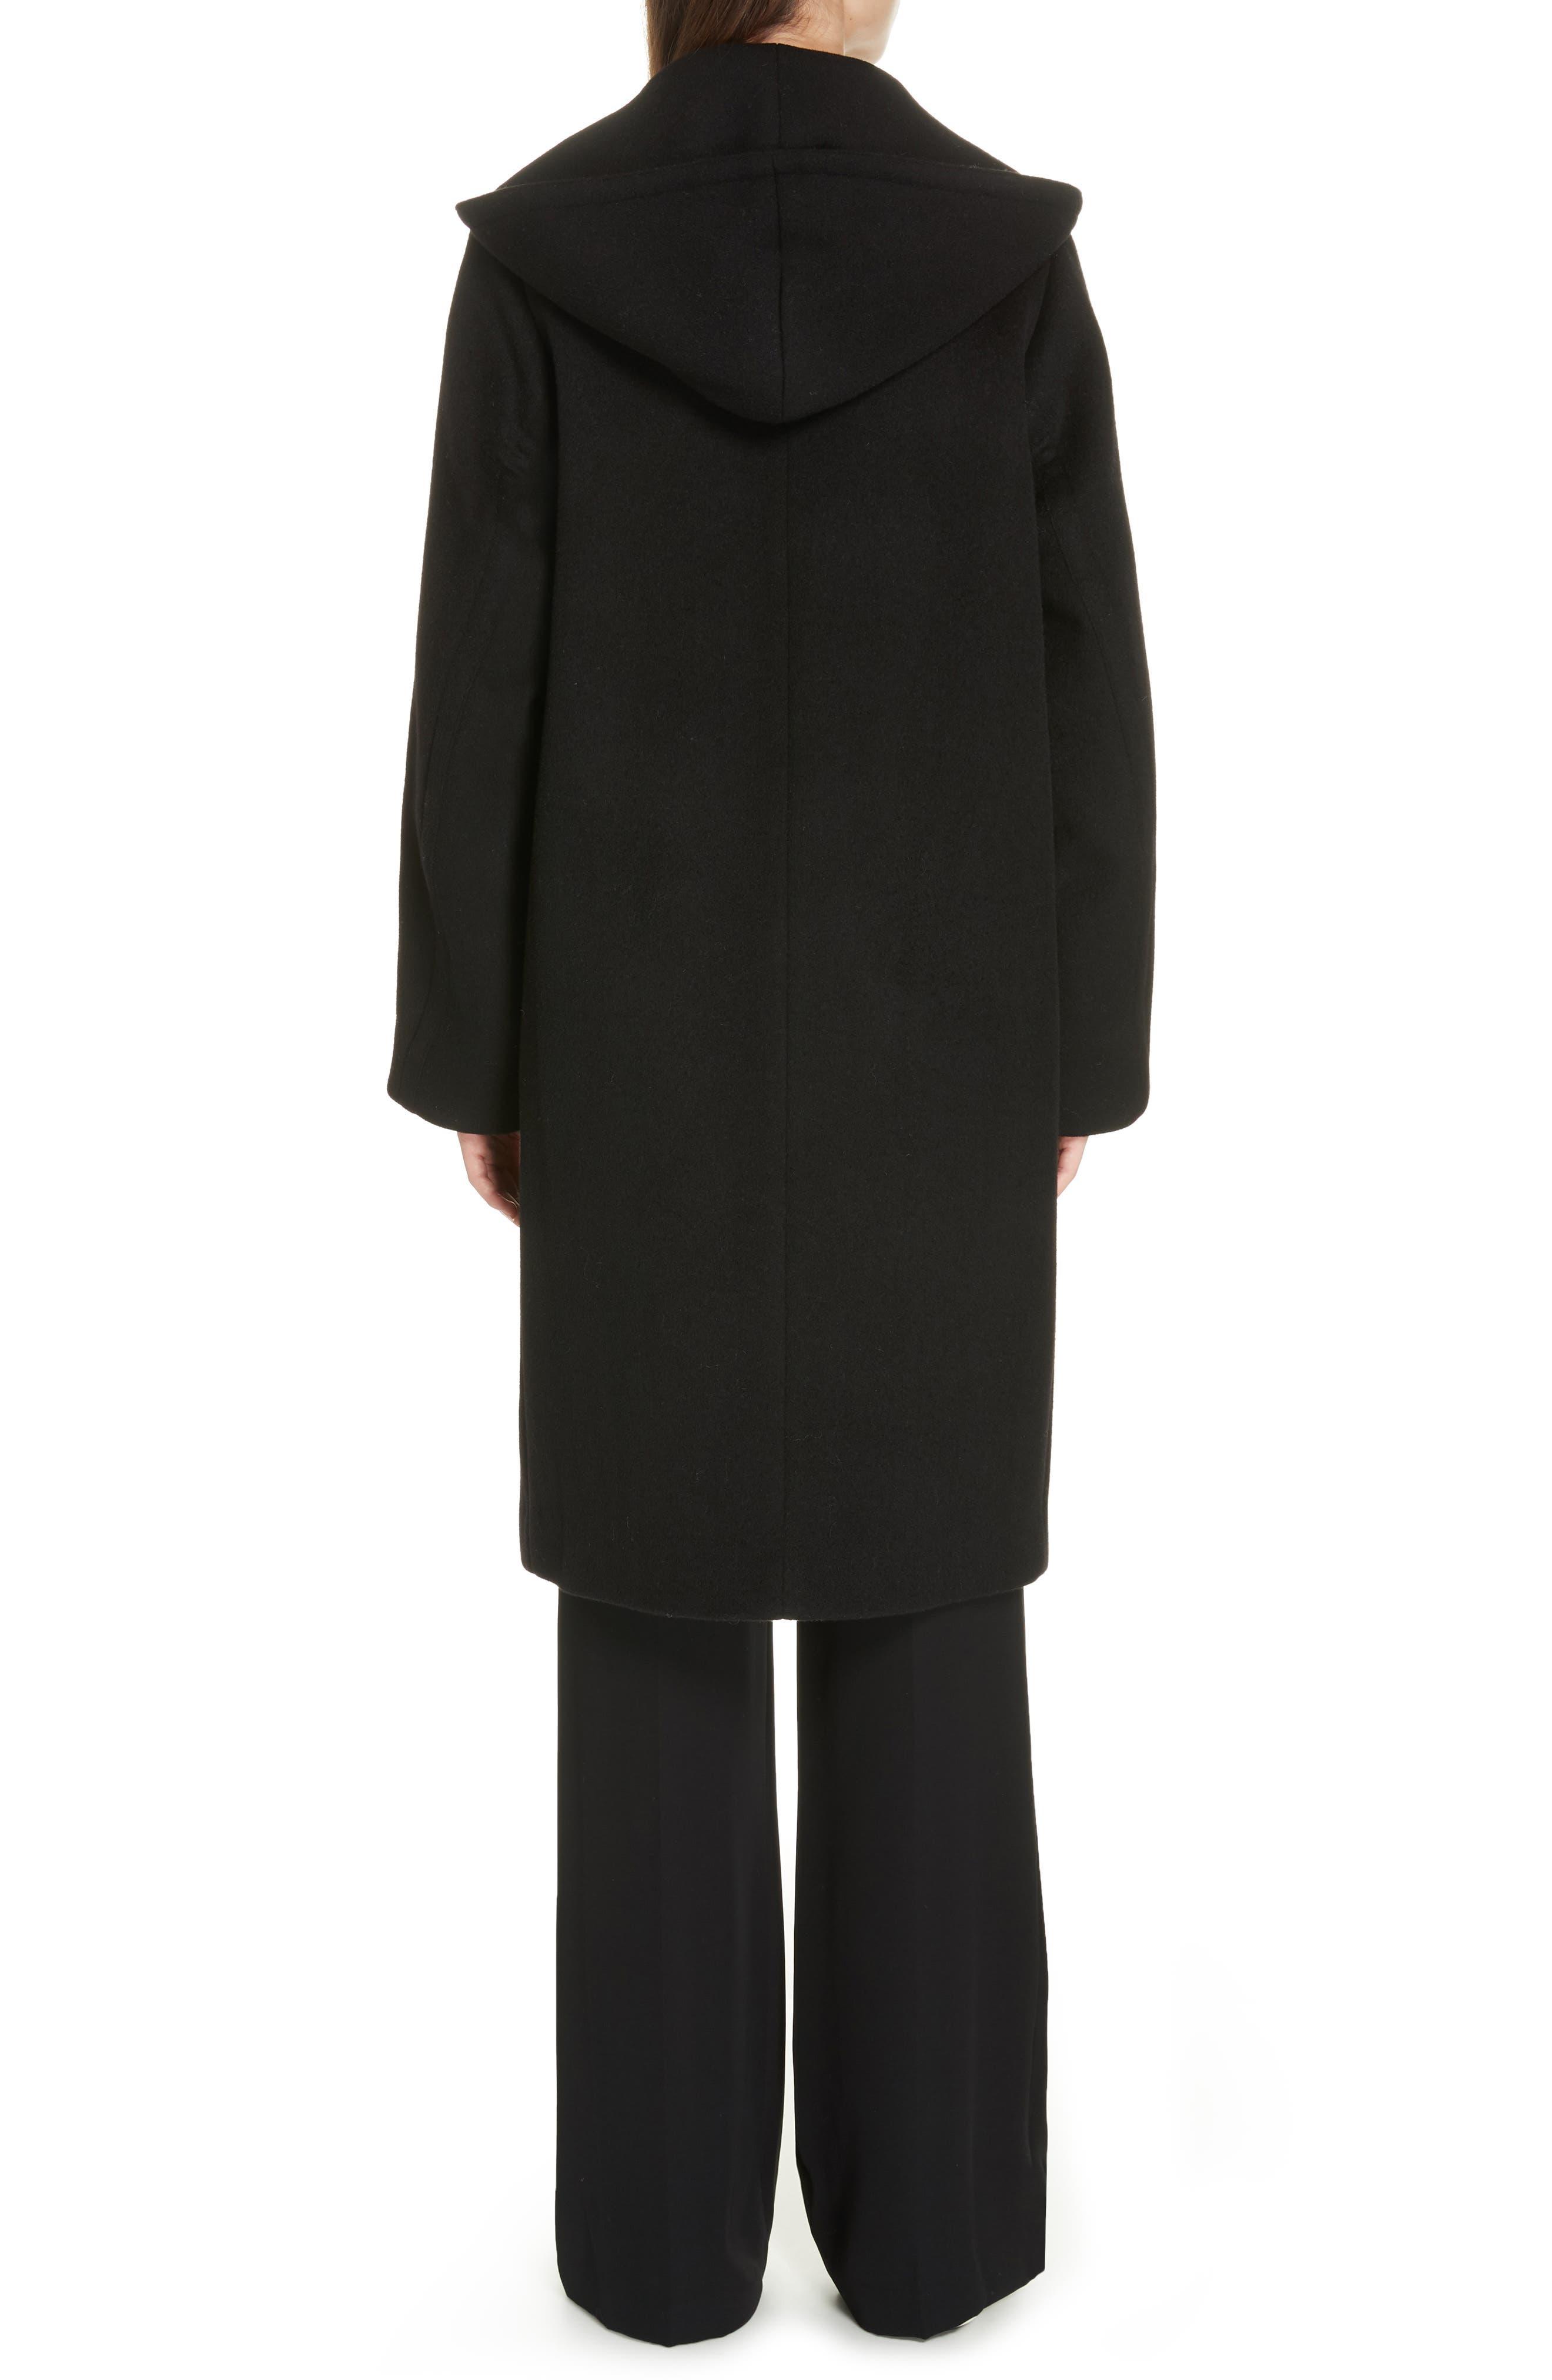 VINCE,                             Hooded Coat,                             Alternate thumbnail 2, color,                             BLACK